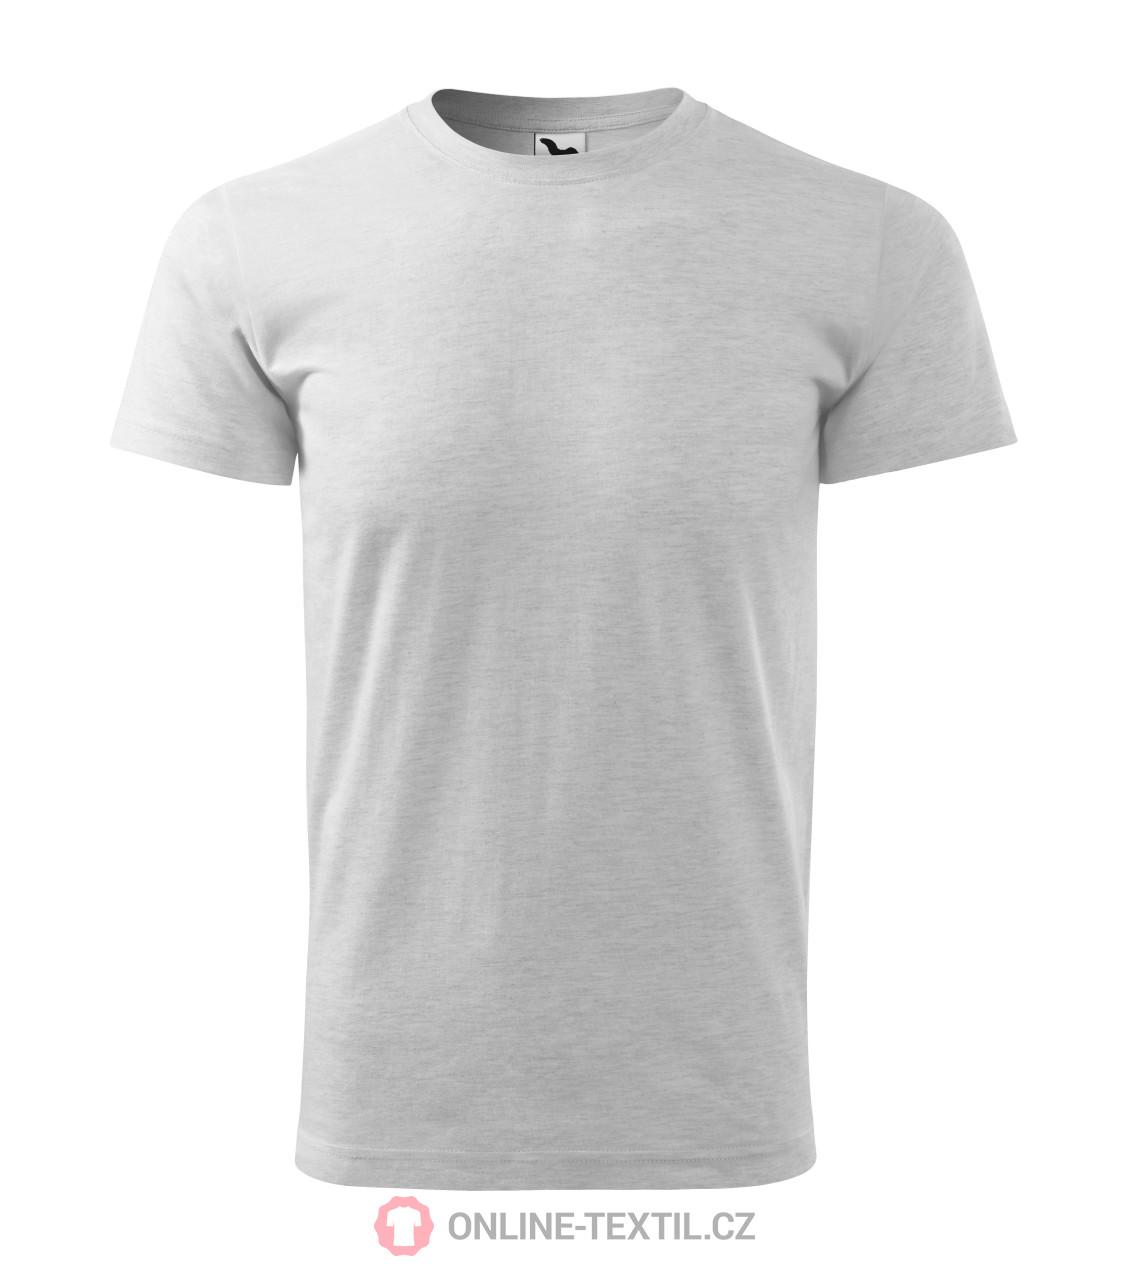 021aa5f122c5 ADLER CZECH Gents T-shirt Basic 129 - ash melange from the MALFINI ...